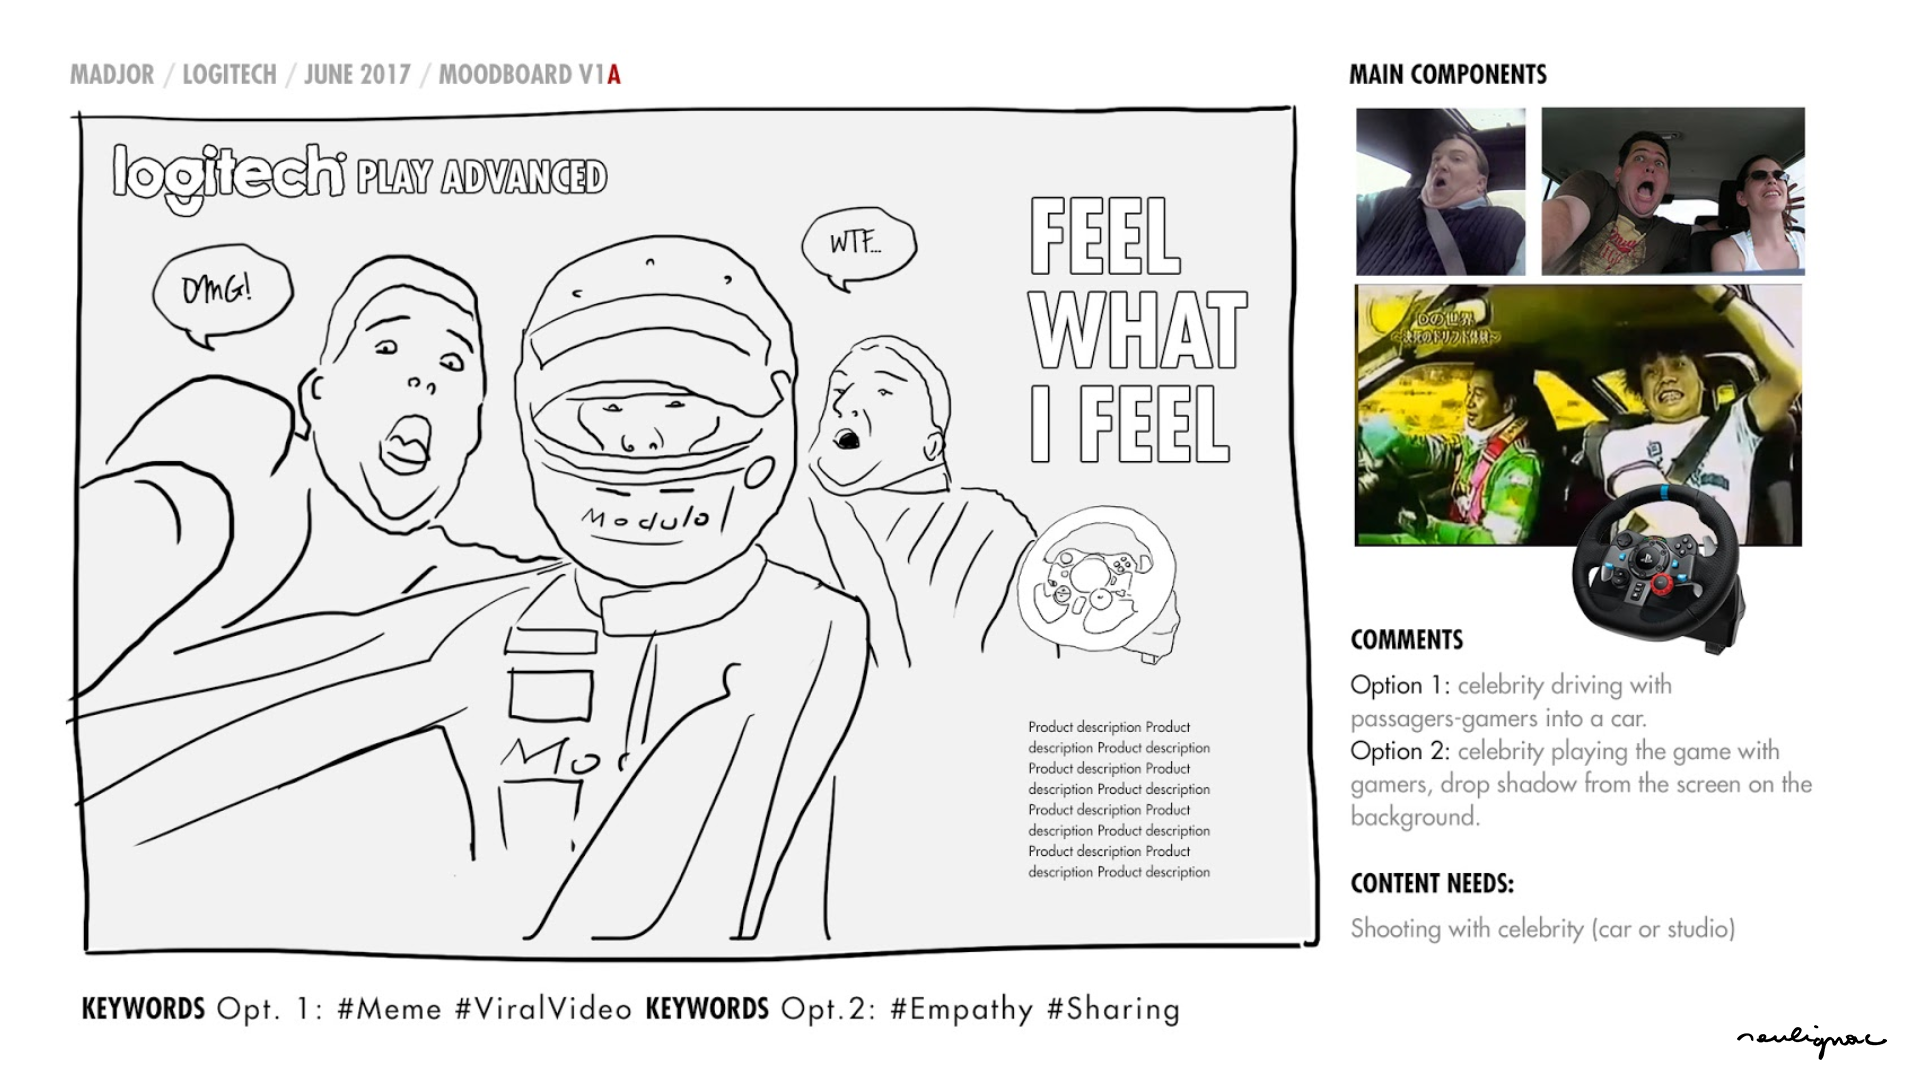 Logitech China - Global Campaign Keiichi Tsuchiya - FELL WHAT I FEEL - KEY VISUAL RESEARCHES & MOODBOARD - Francois Soulignac - Digital Creative & Art Direction - MADJOR Labbrand Shanghai, China